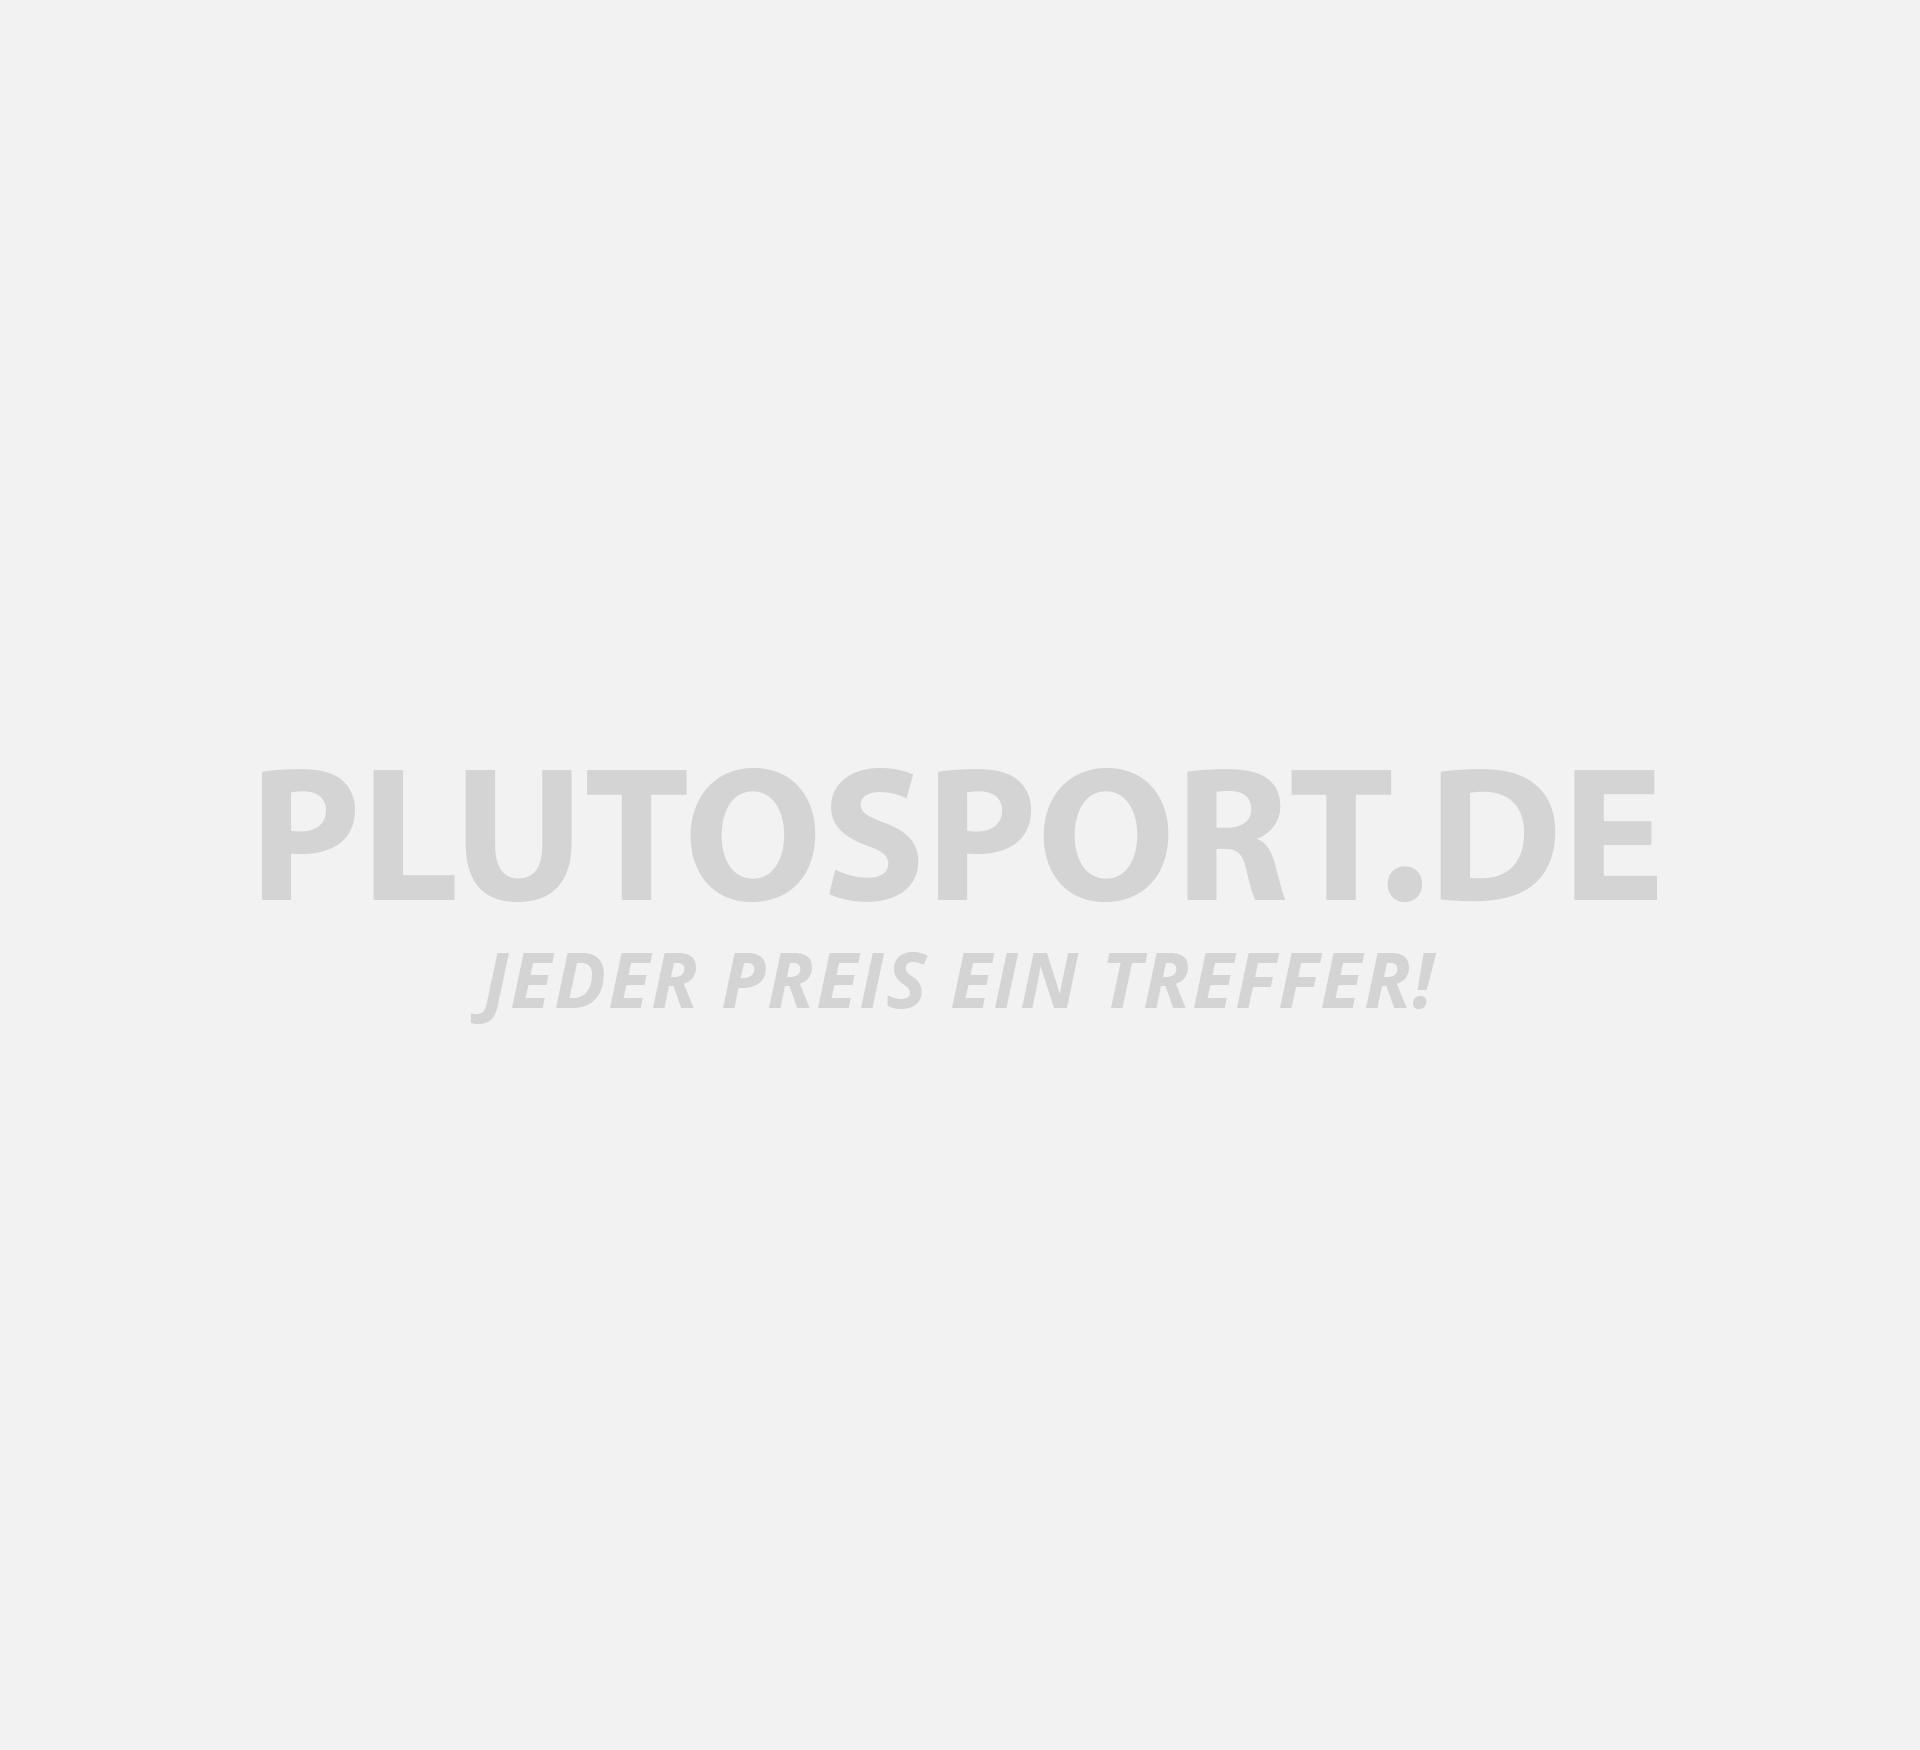 Reusch Attrakt S1 Evolution Torwarthandschuhe Senior